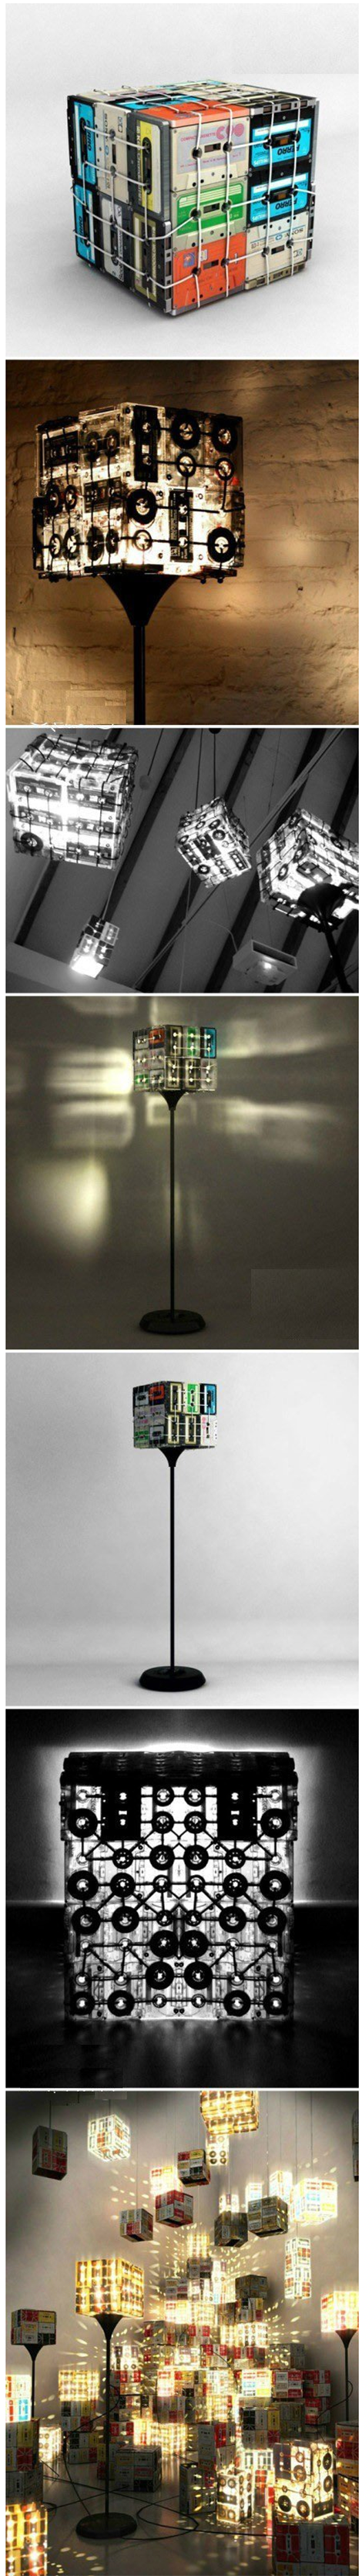 Great Tapes Lamp | DIY & Crafts Tutorials